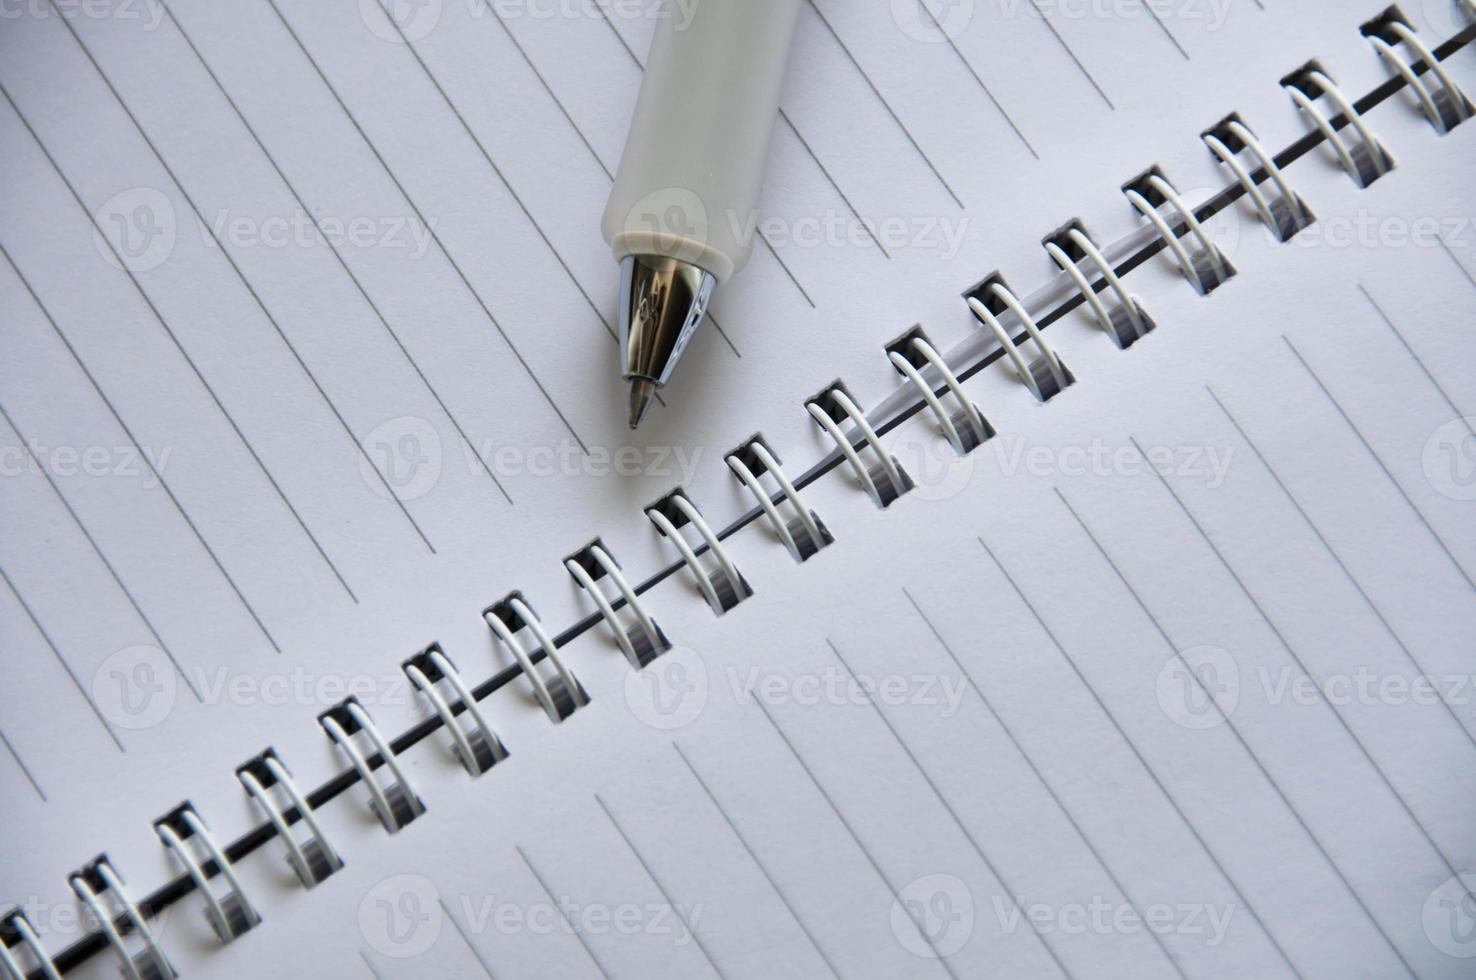 Notebook, empty planner photo